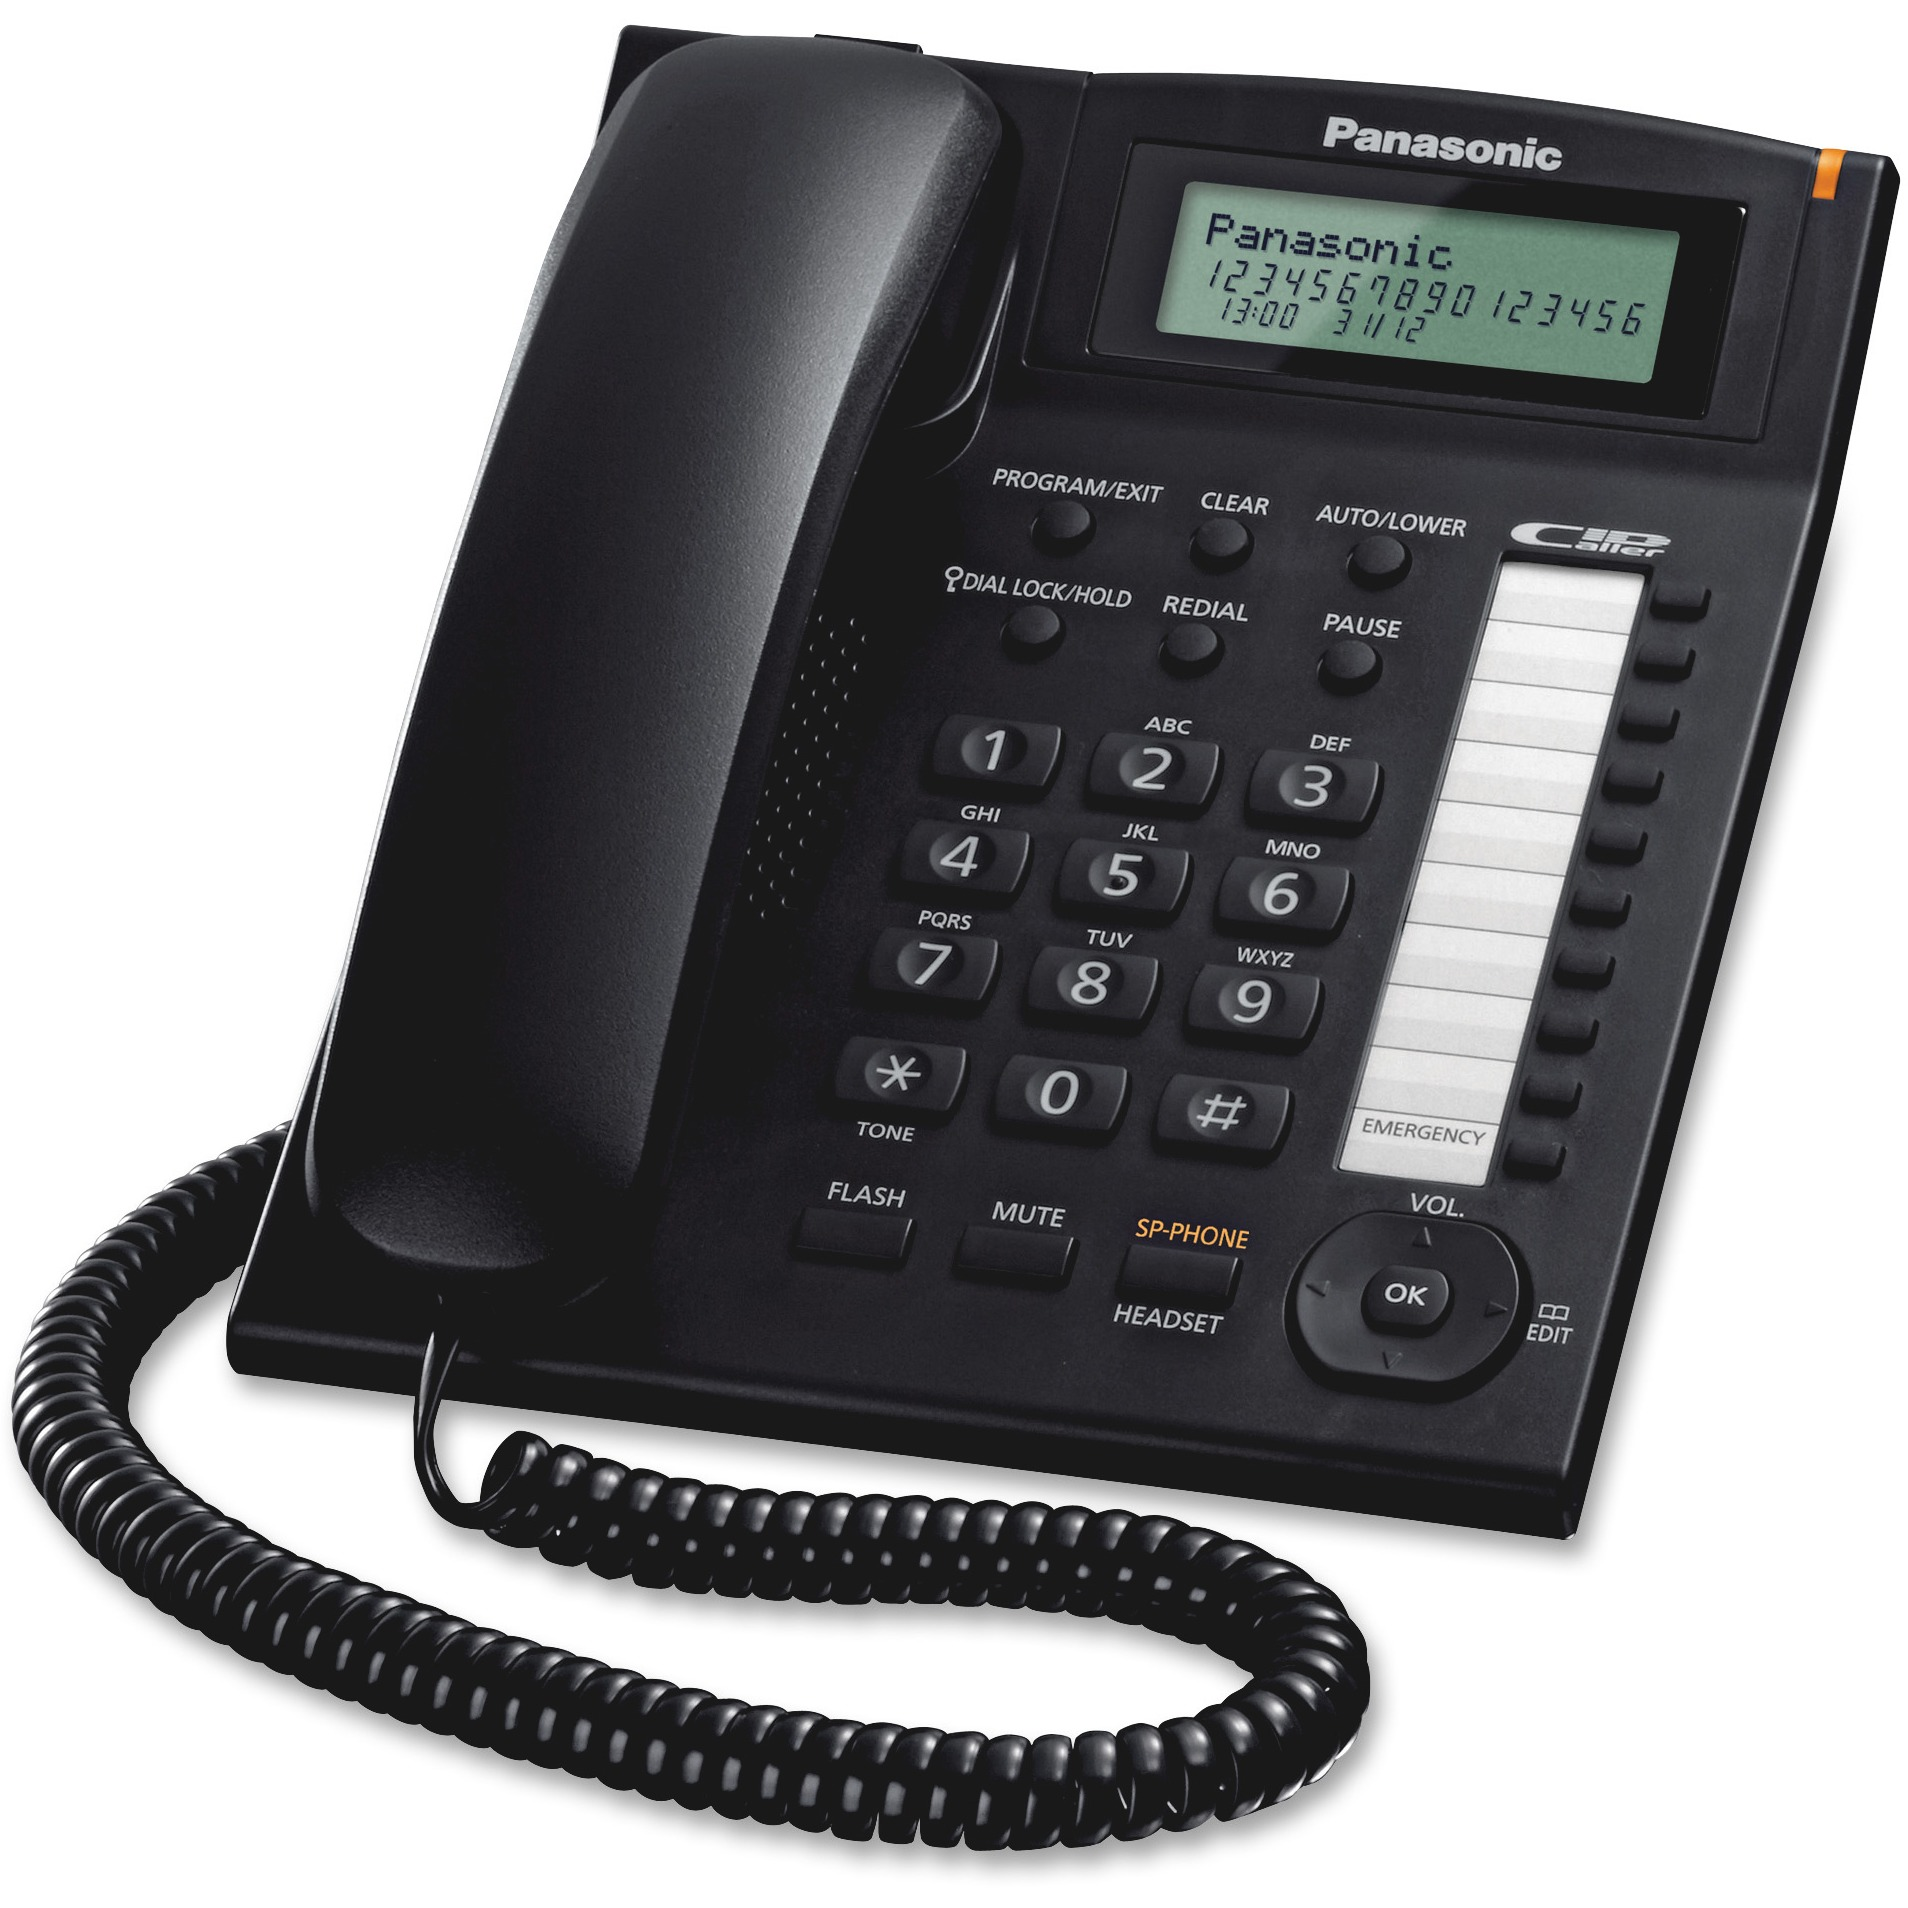 Panasonic, PANKXTS880B, 1-tch Dialer Stations Bus. Phone System, 1